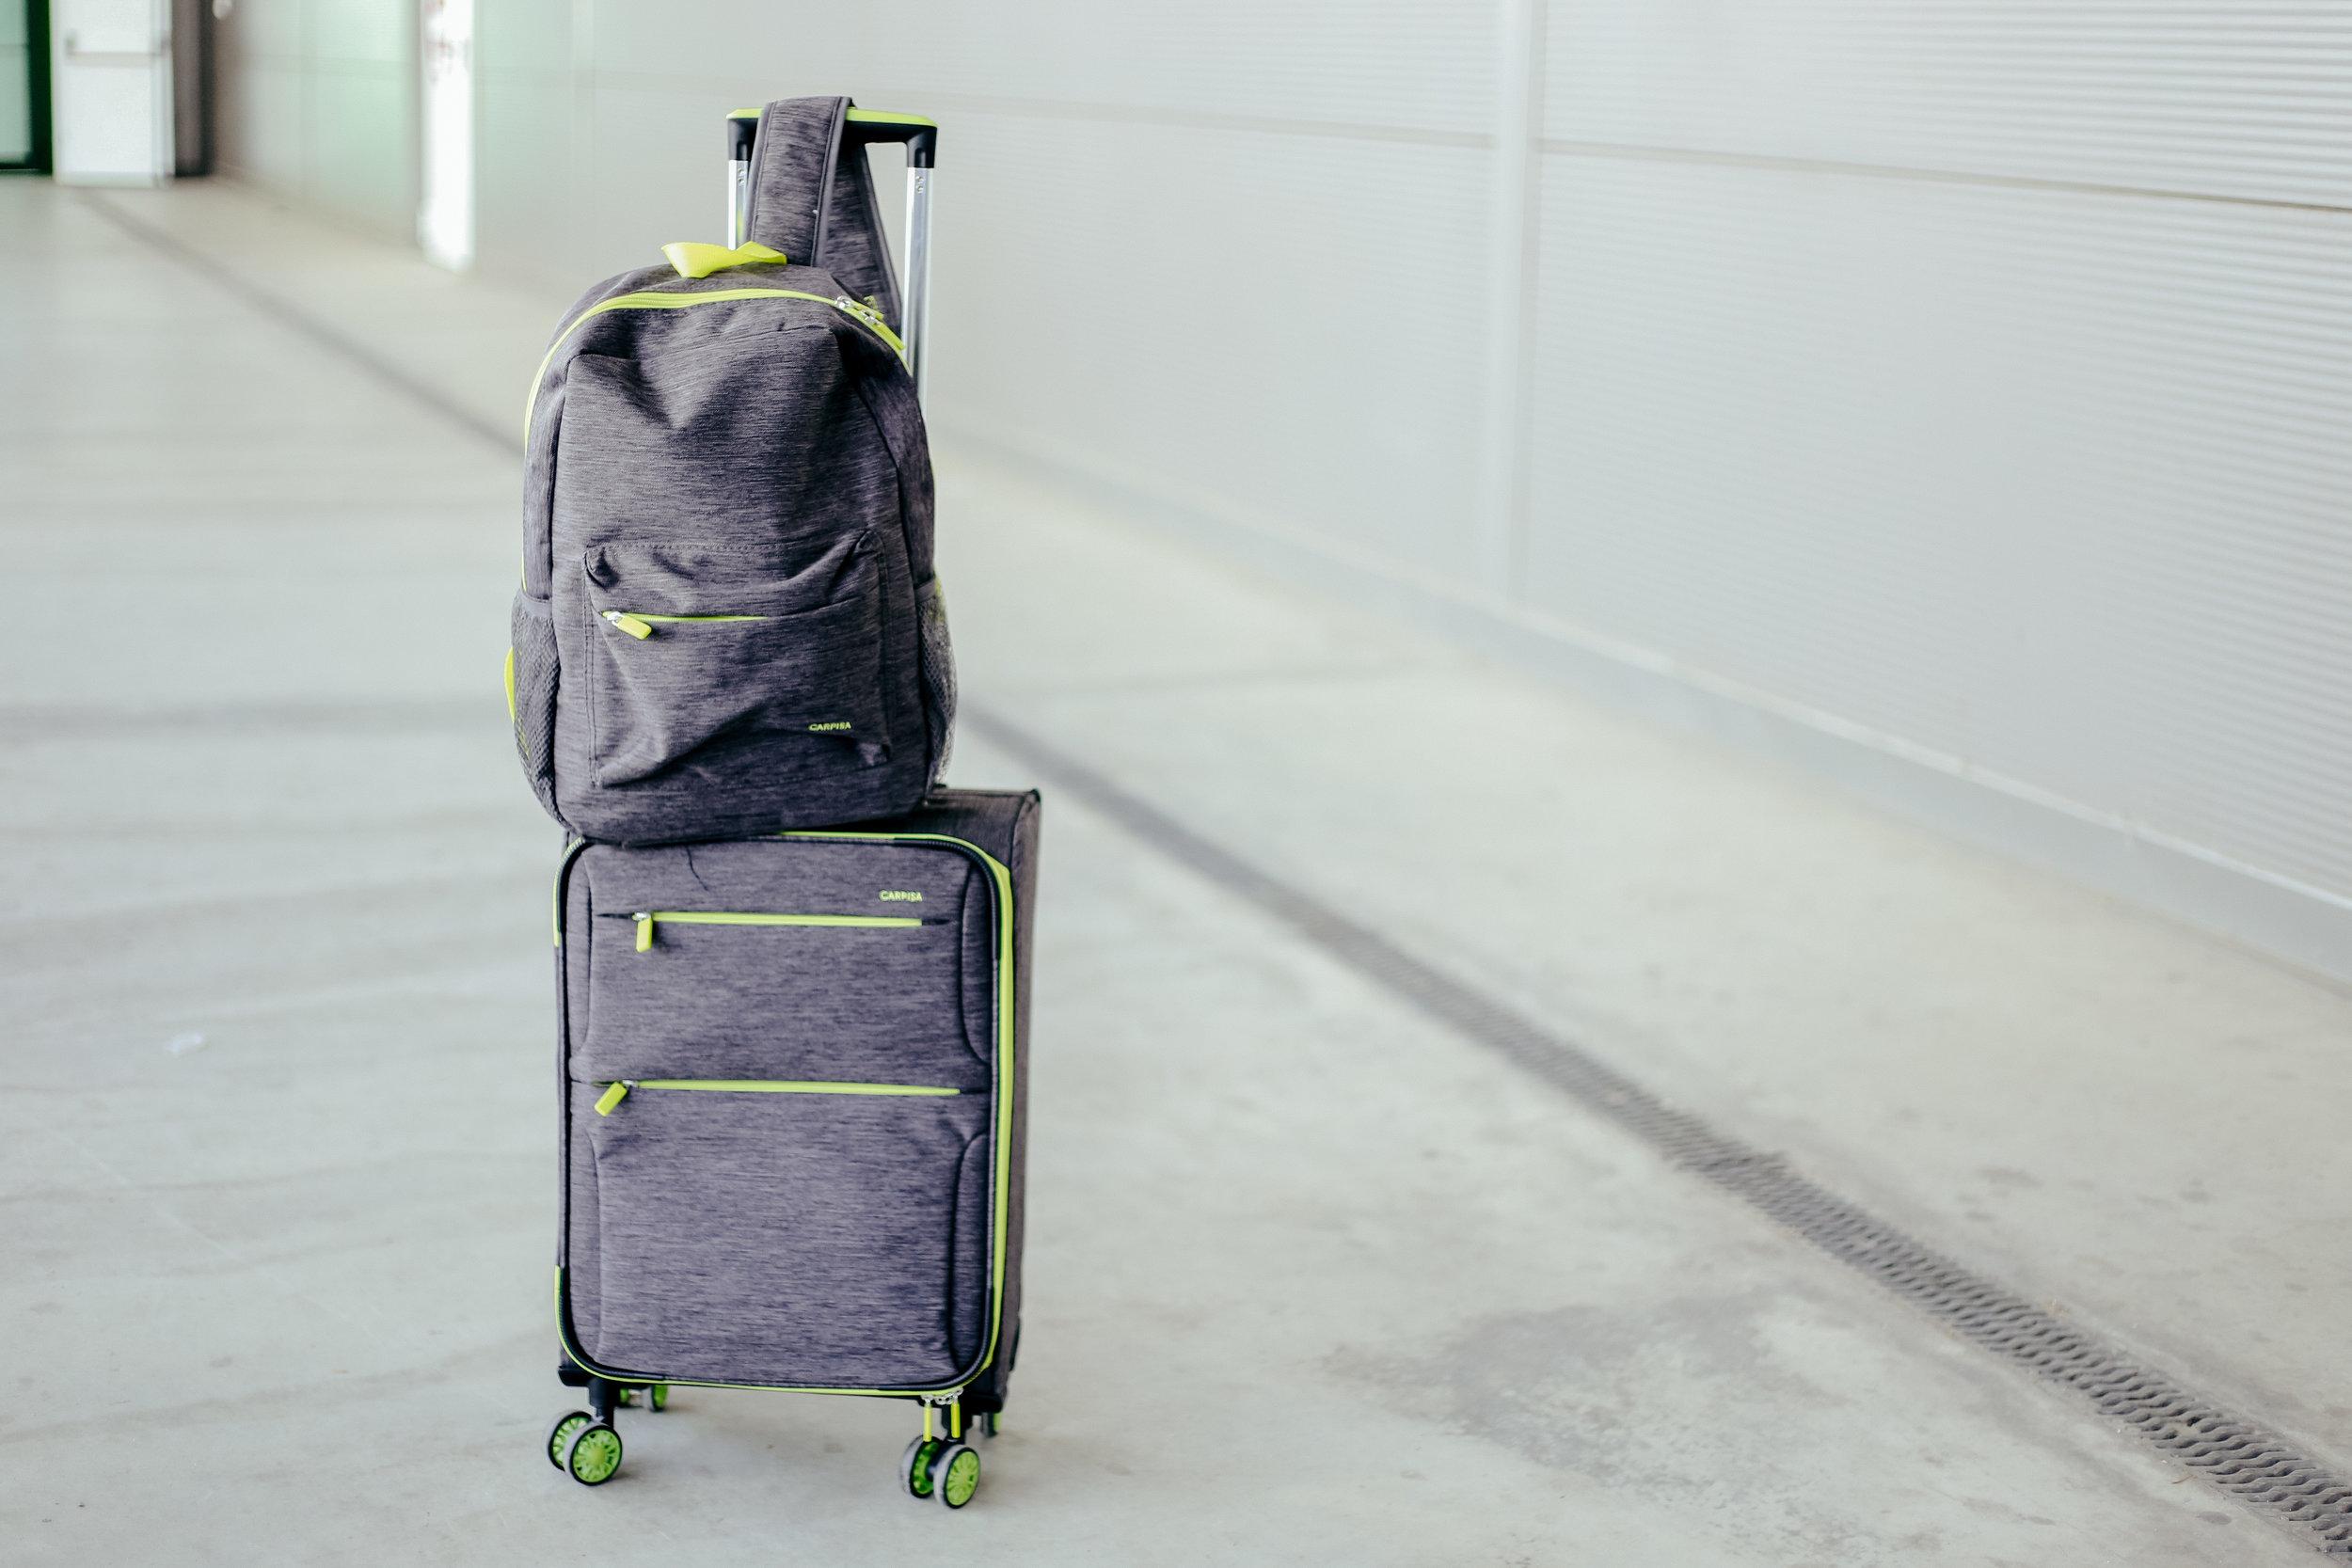 Куфер= 5190 денари Ранец= 2090 денари